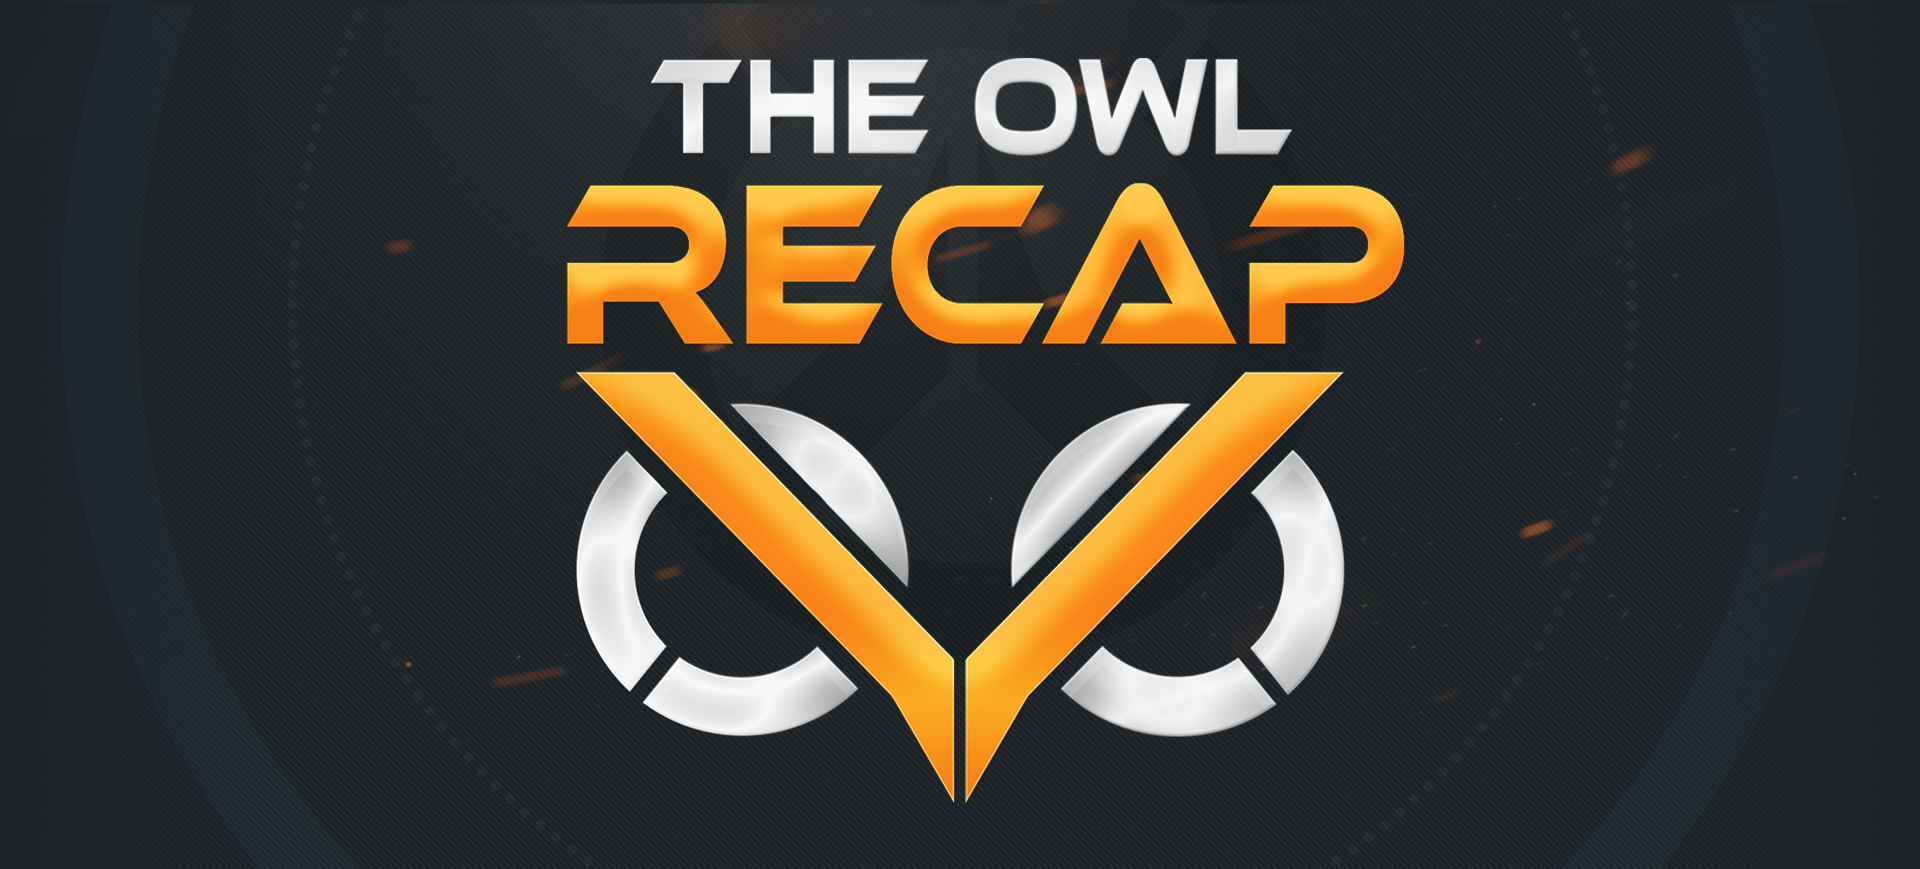 OWL Recap Logo.png